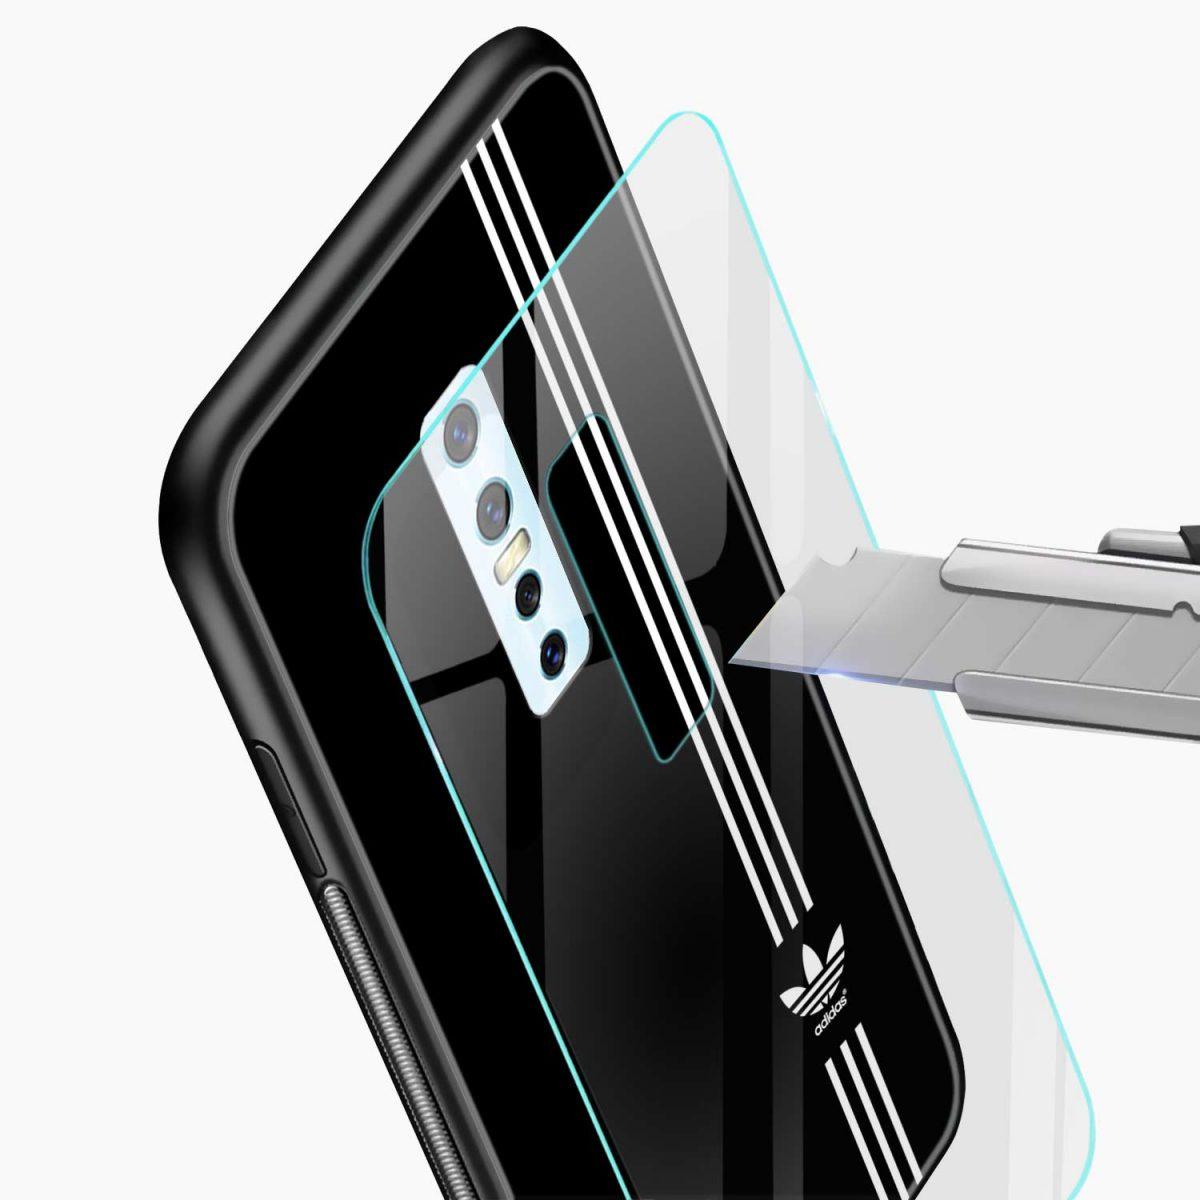 white strips adidas glass view vivo v17 plug back cover